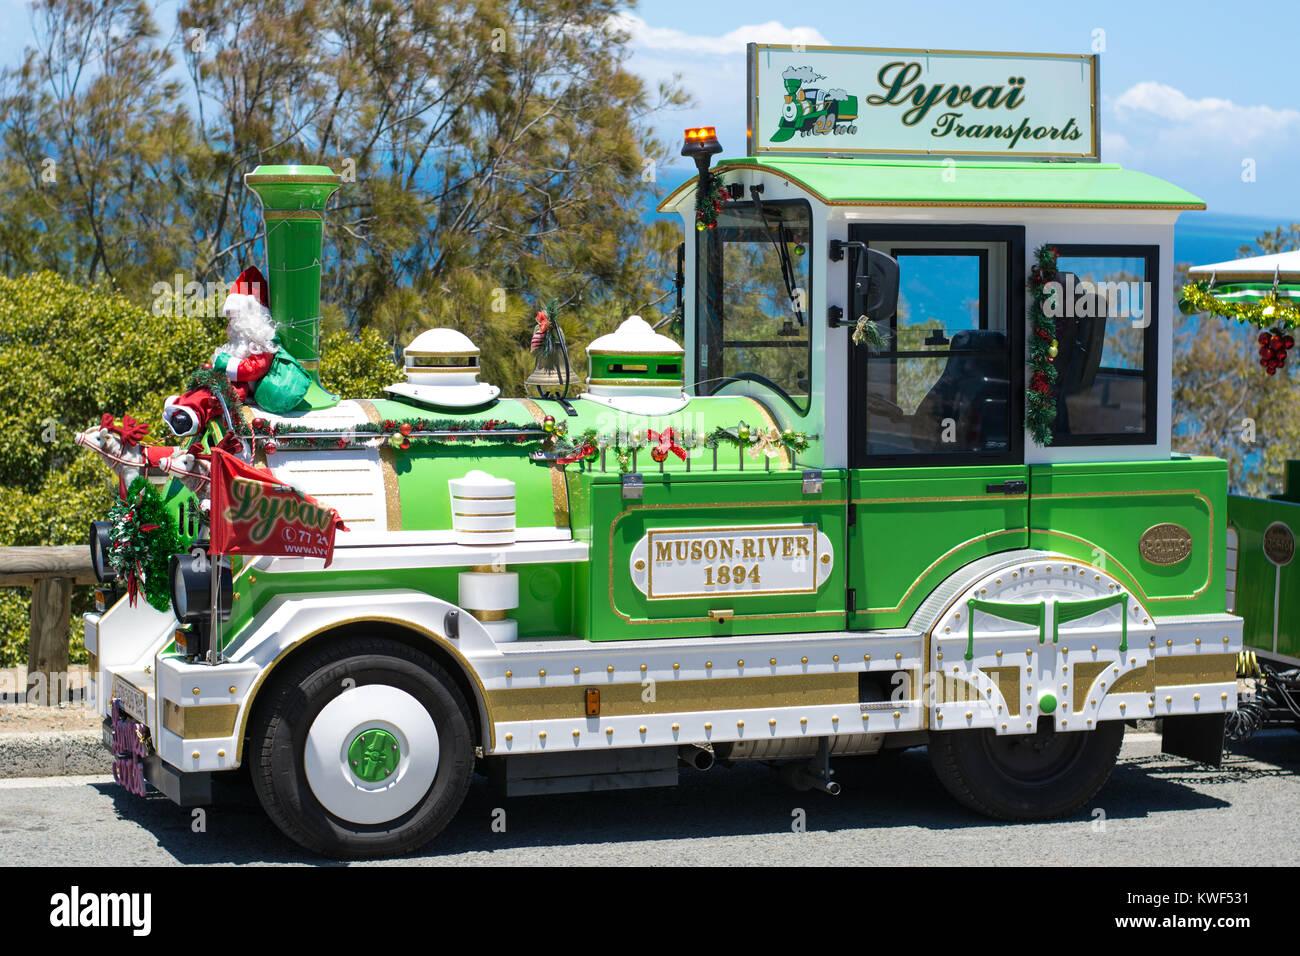 The Green Train touring Noumea - Stock Image